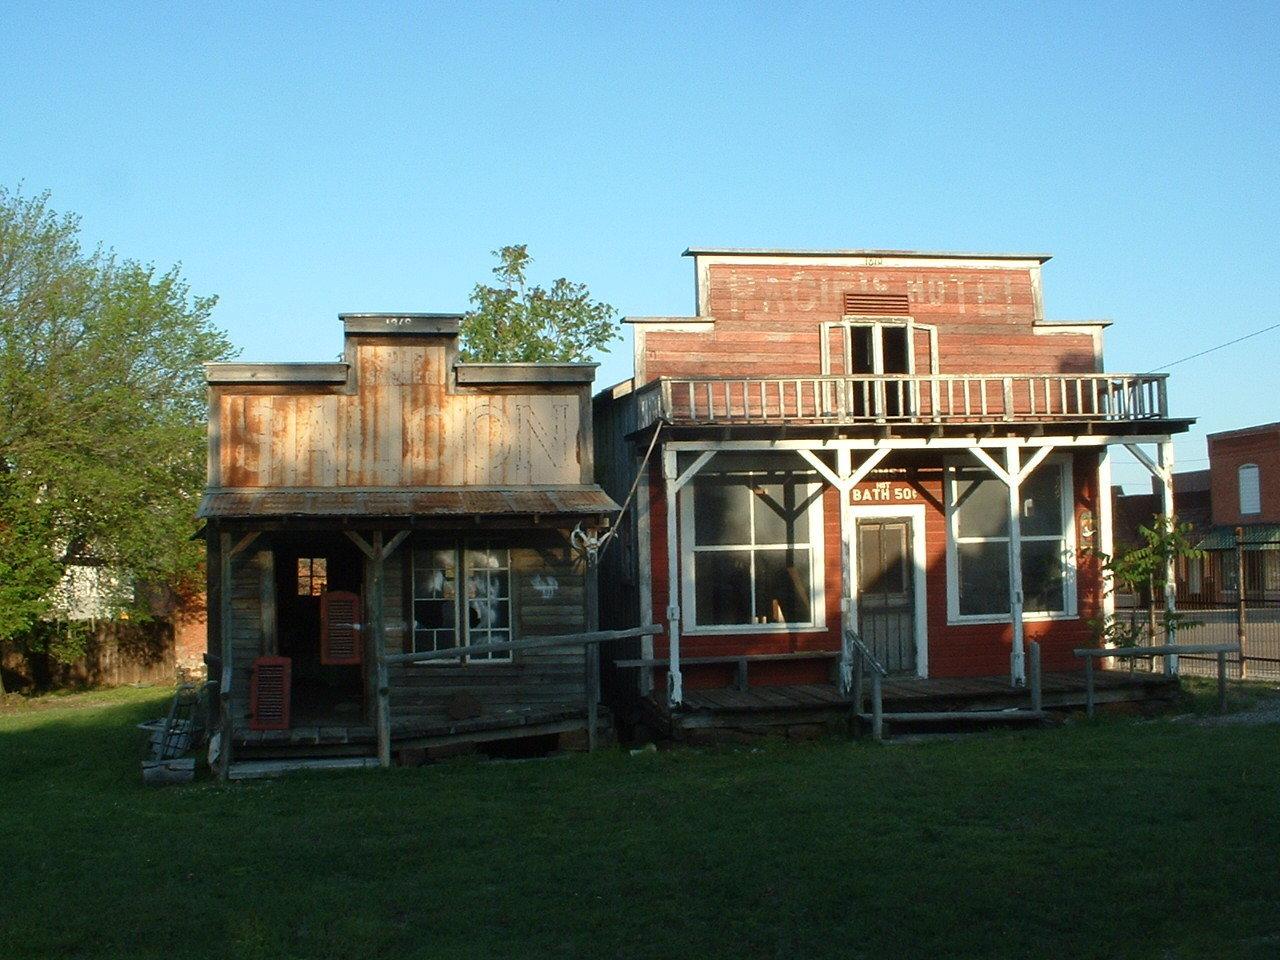 Alien-inhabited Kansas ghost town up for auction on eBay